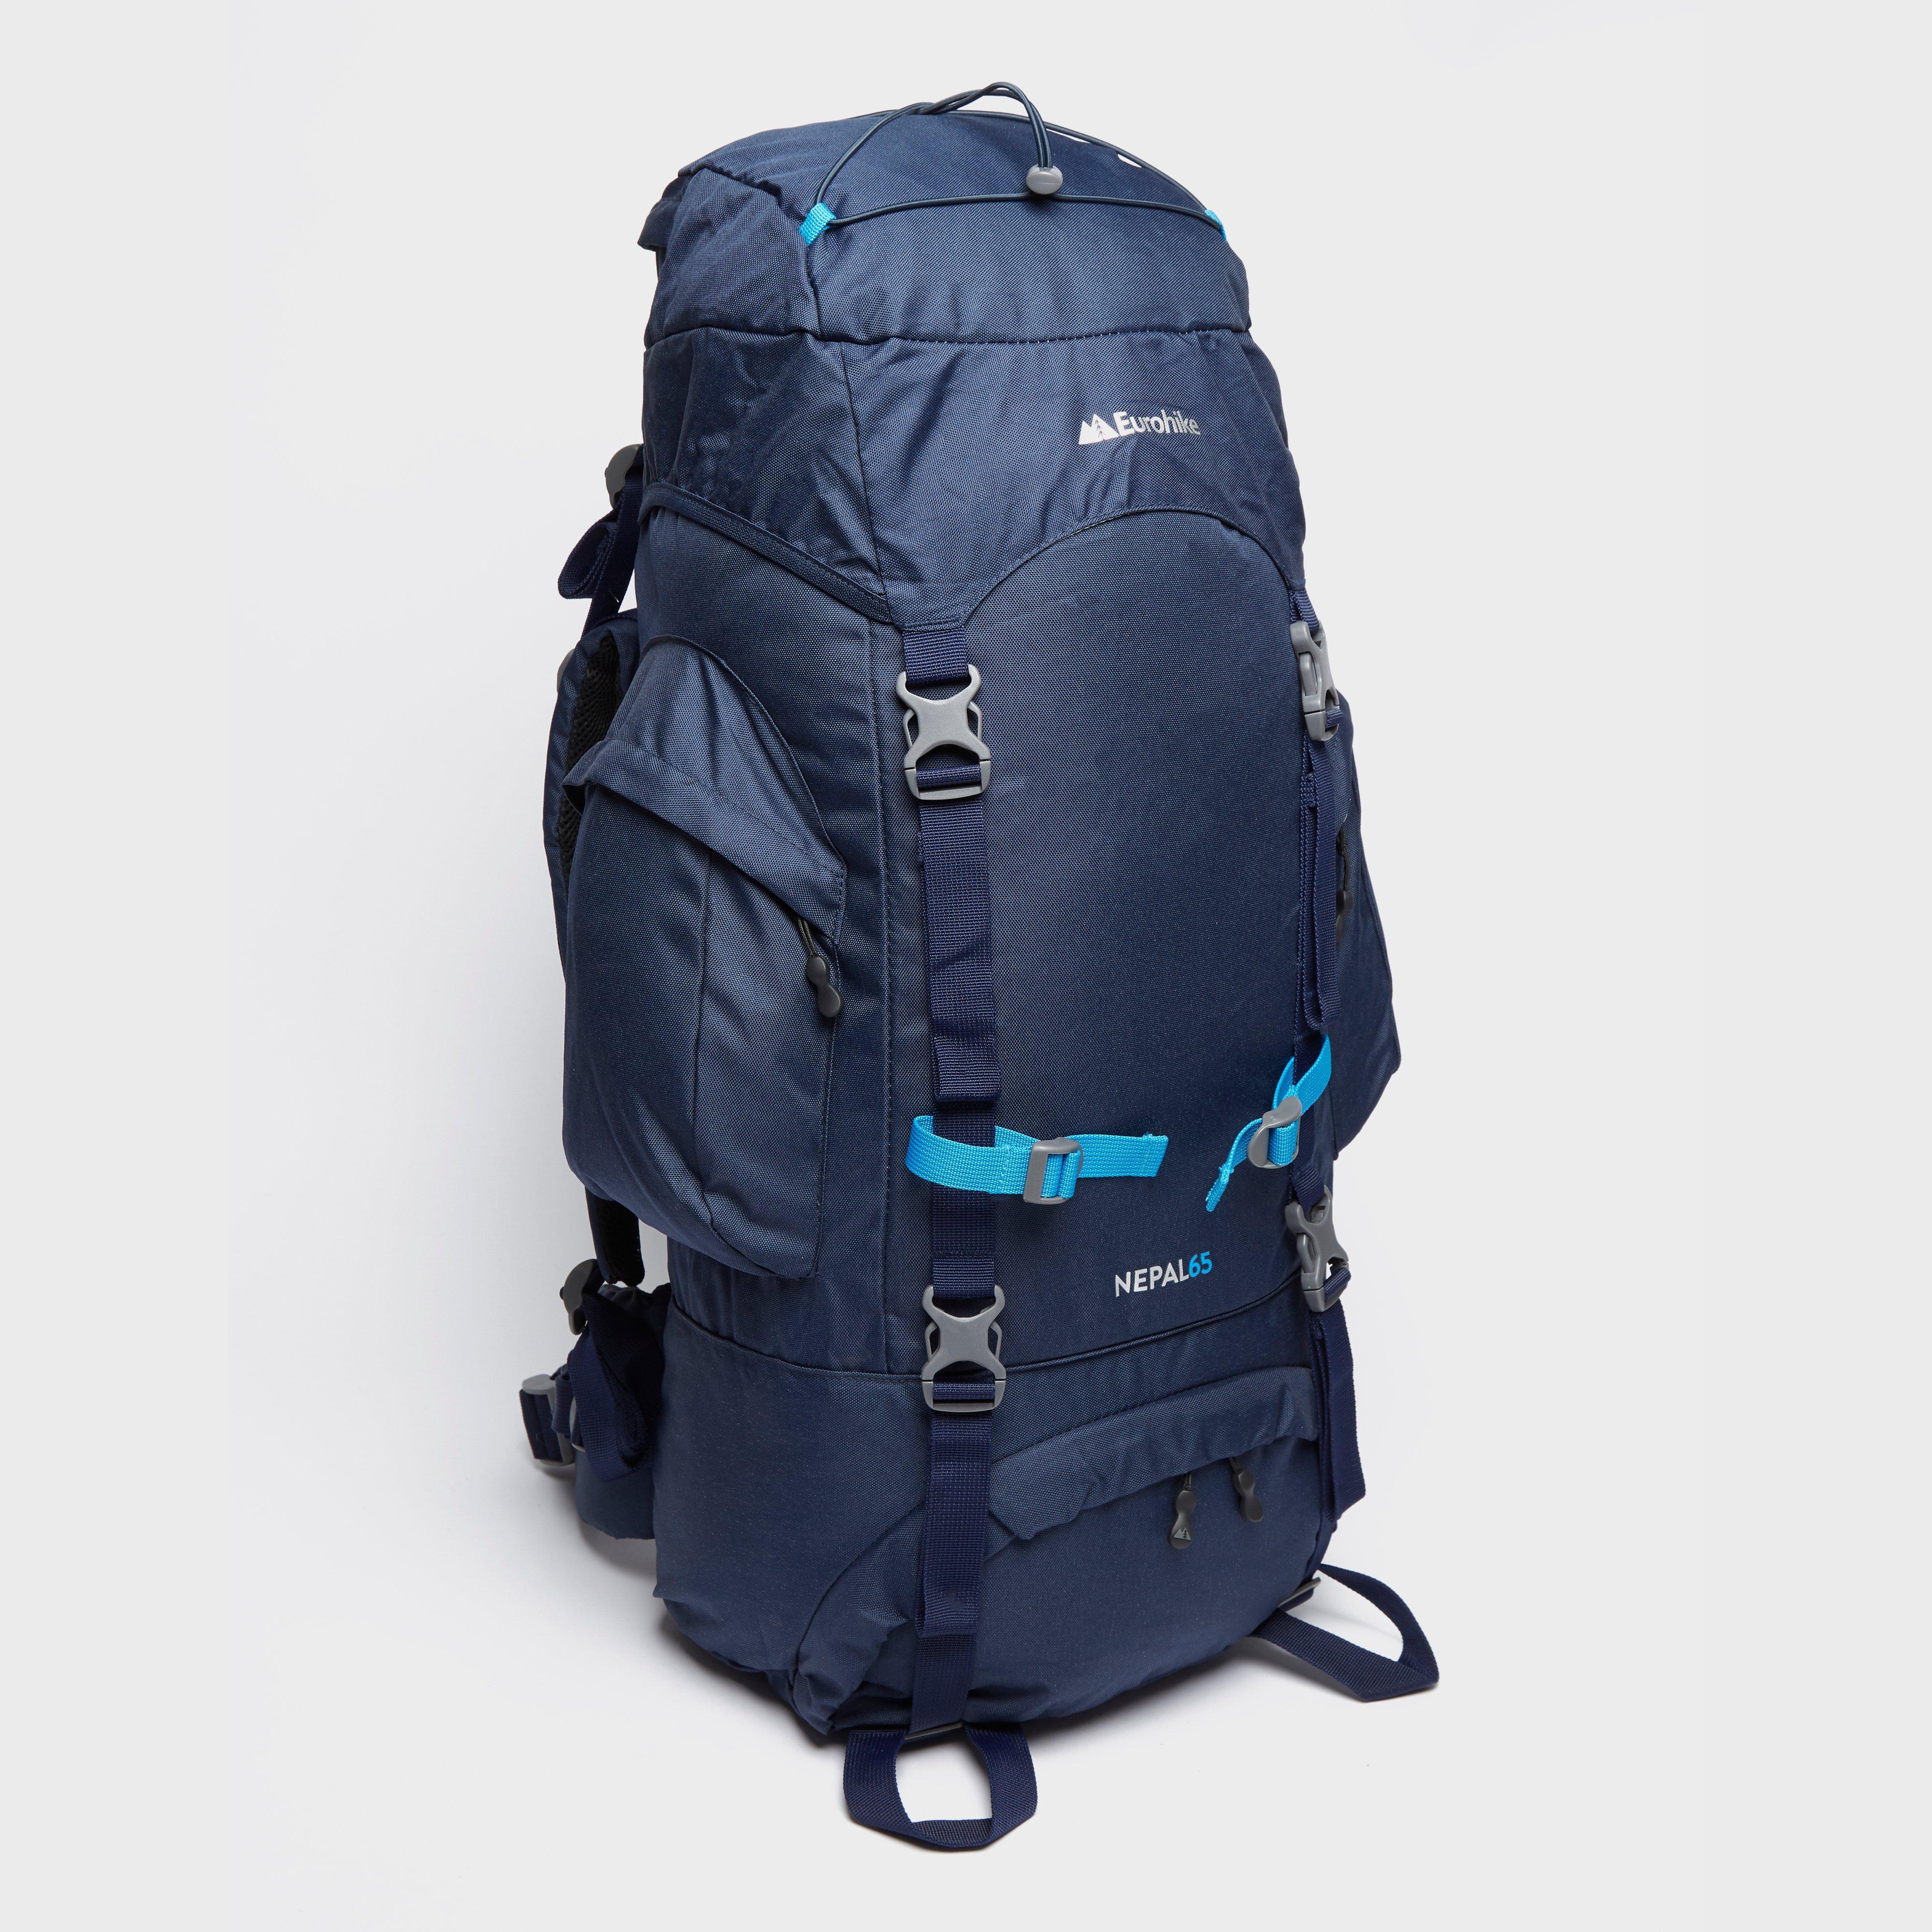 Eurohike Eurohike Nepal 65 Rucksack, Navy